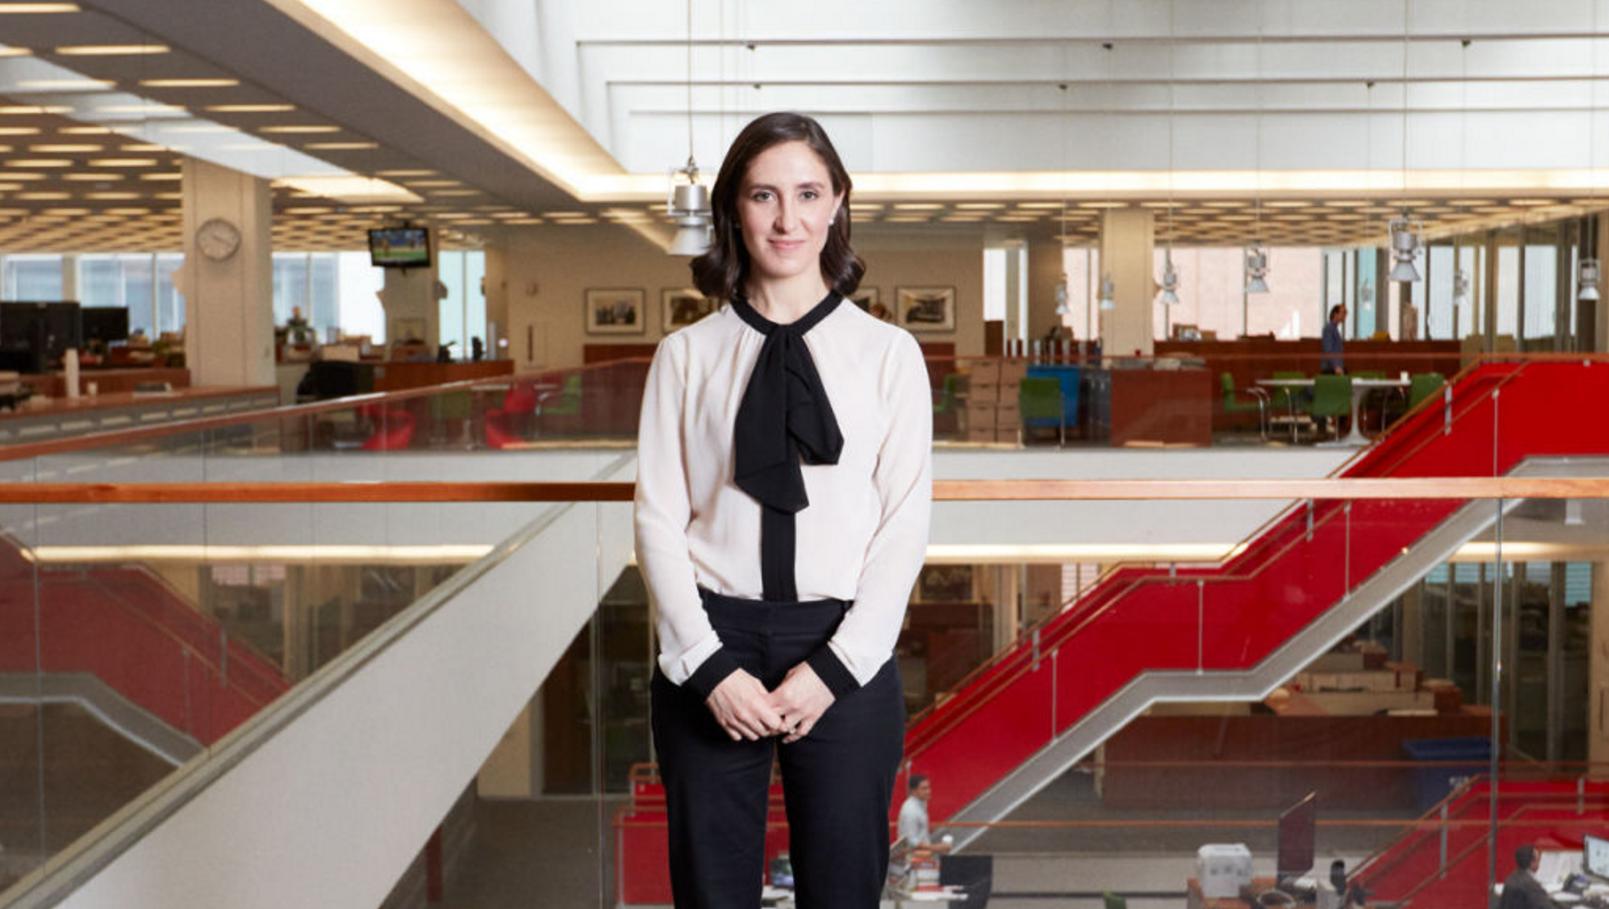 Meet Emily Steel, the Reporter Who Took Down Fox News Star Bill O'Reilly